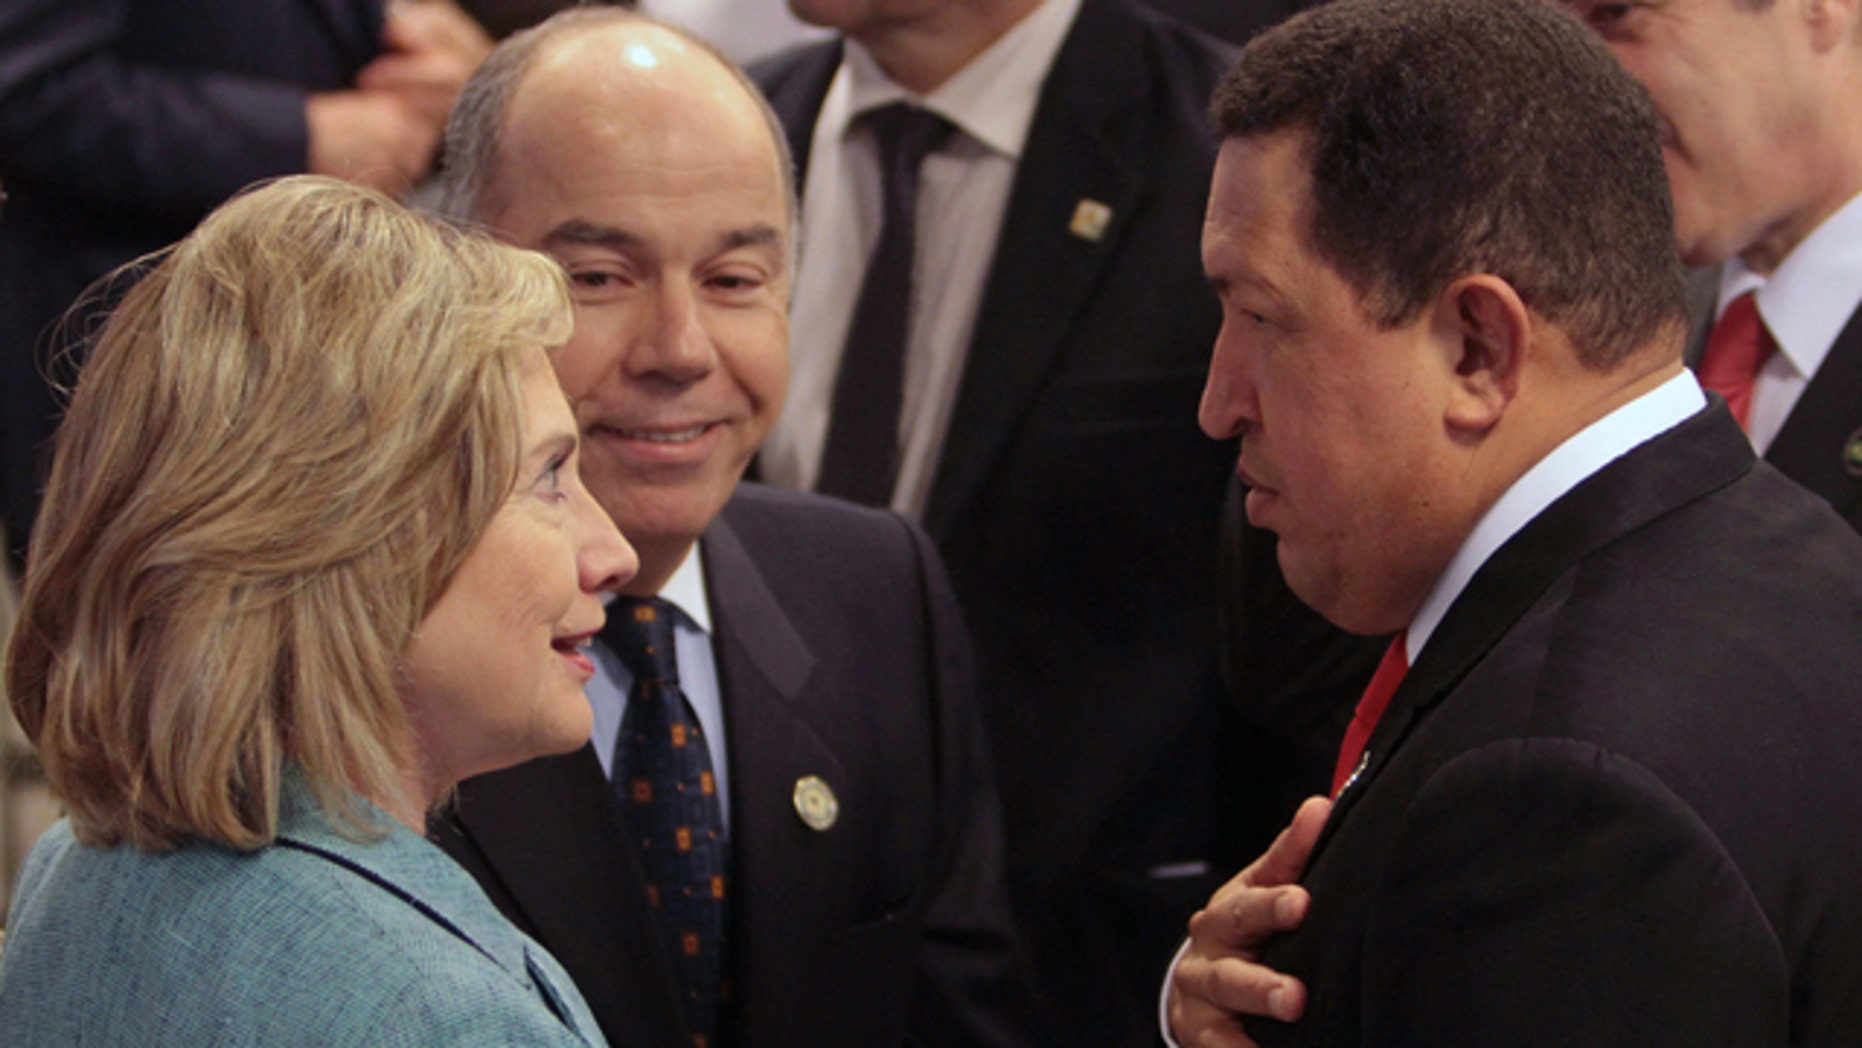 Jan. 1, 2011: U.S. Secretary of State Hillary Clinton speaks with Venezuela's President Hugo Chavez during the swearing-in ceremony of Brazil's President Dilma Rousseff